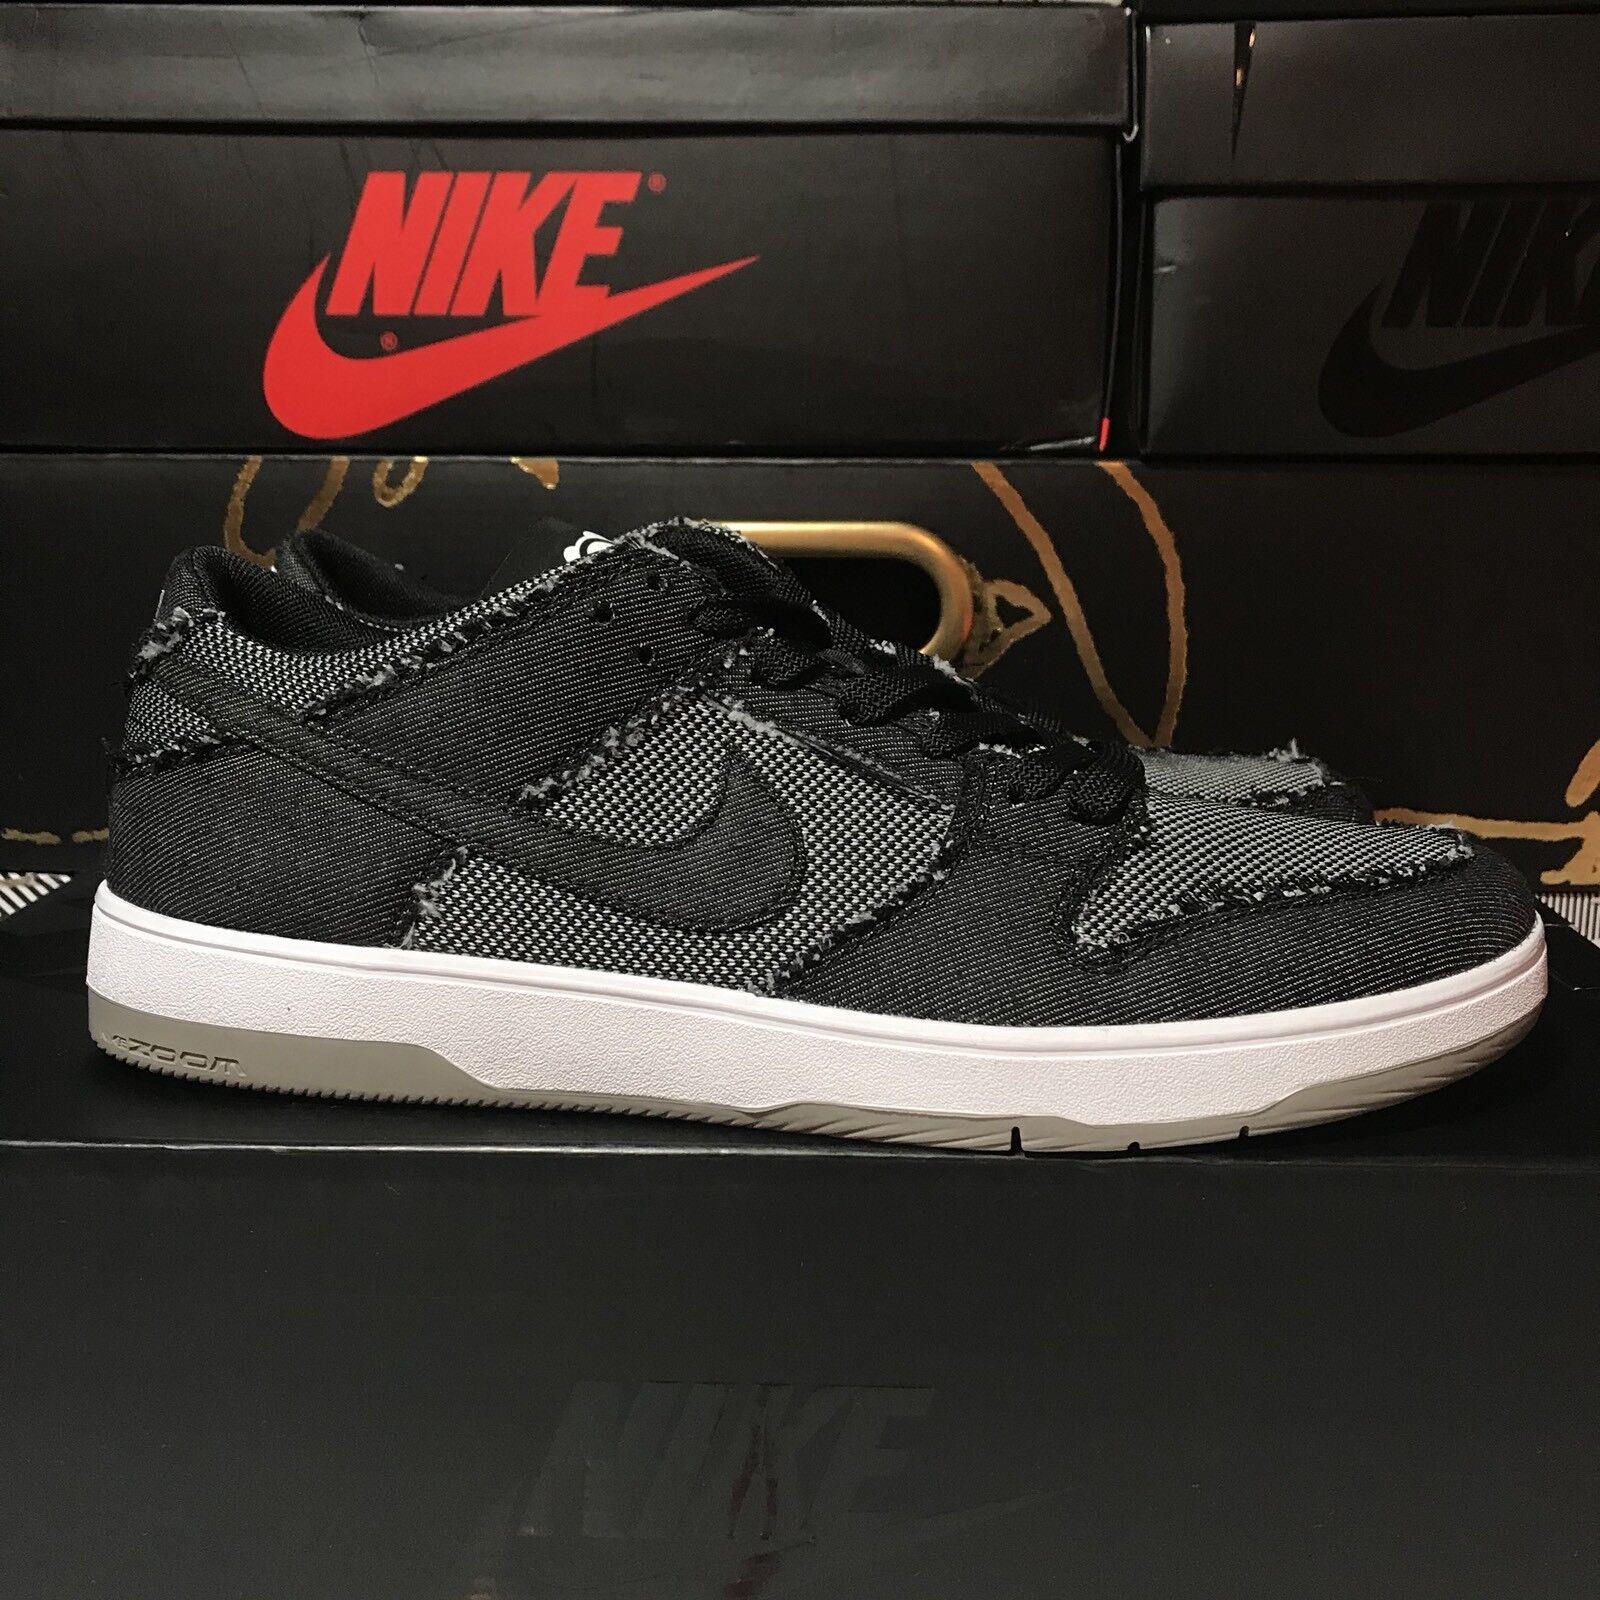 Nike SB Zoom Dunk Low Elite QS BearBrick Black White Grey 877063 002 Size 9